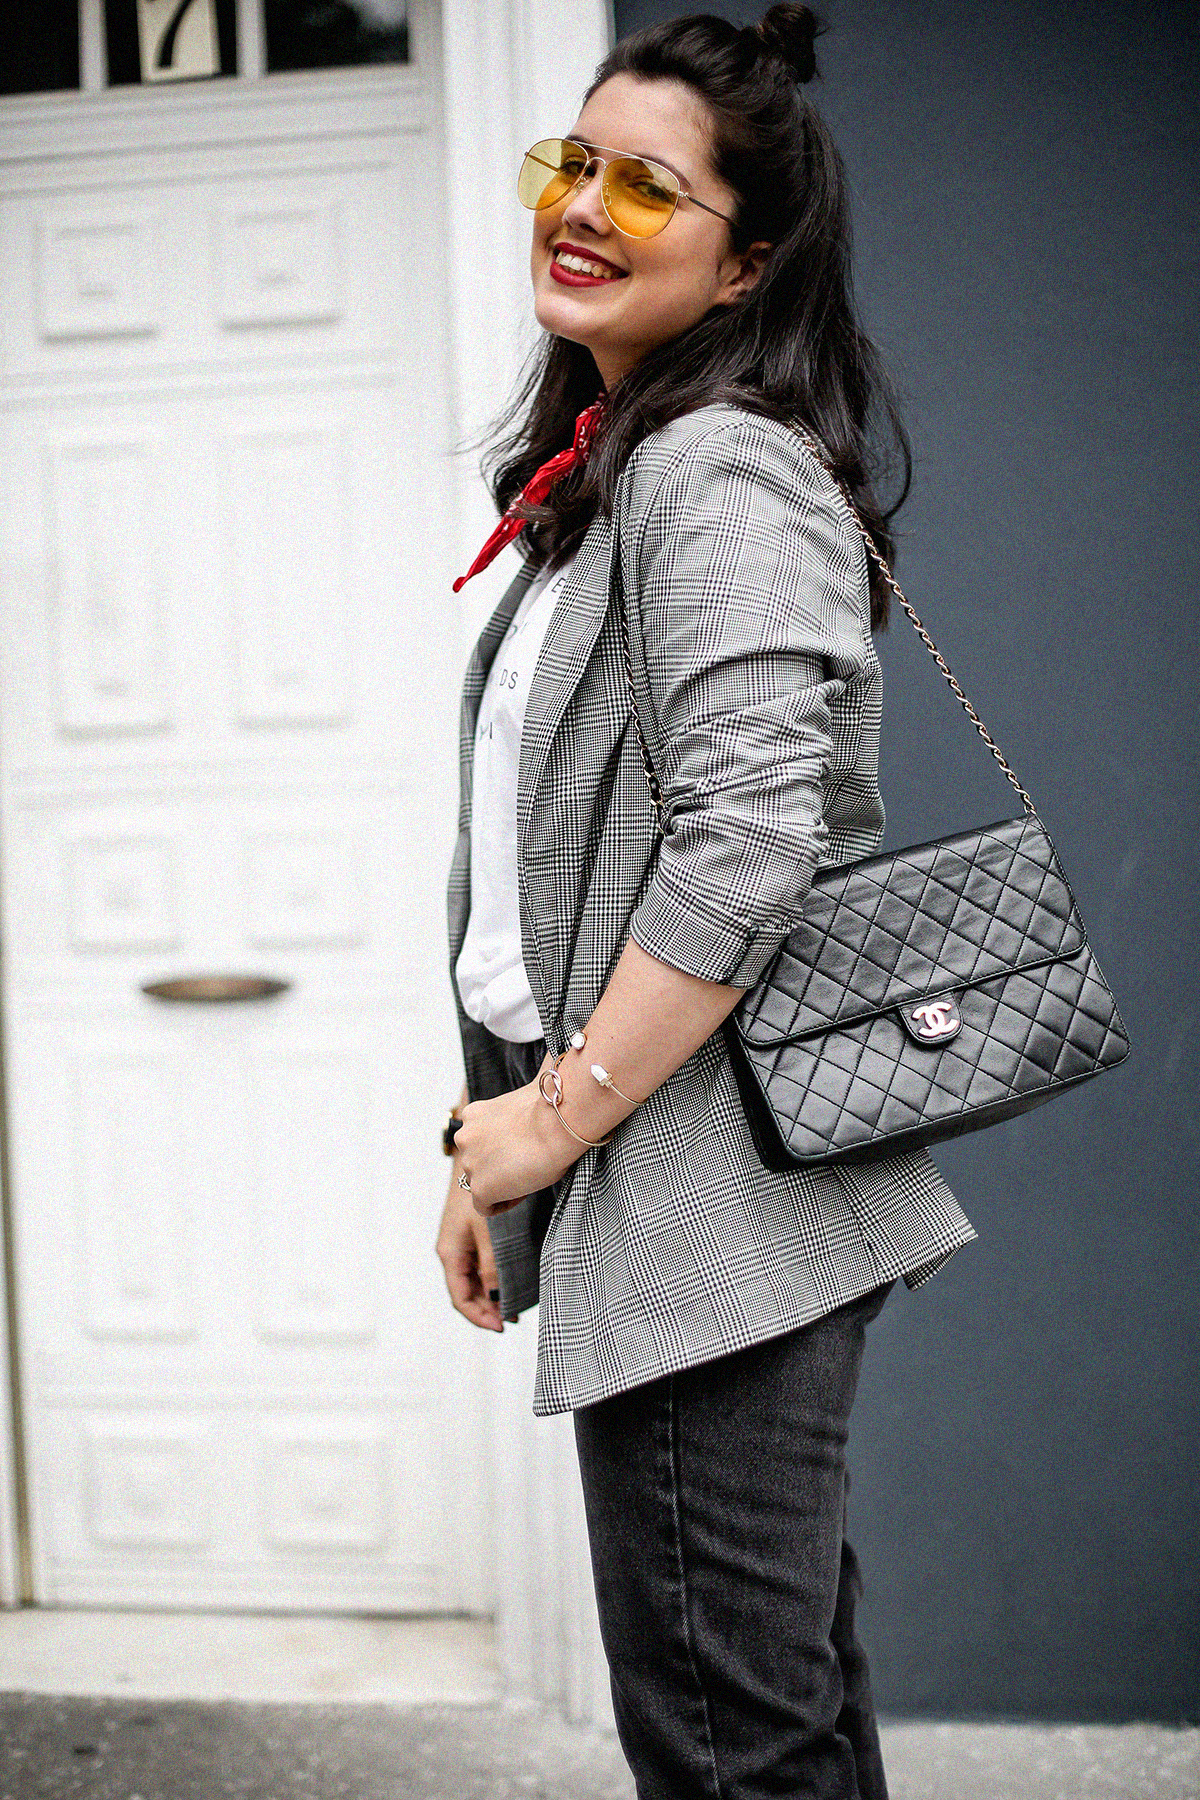 blazer-gris-cuadros-bershka-bandana-roja-mom-jeans-myblueberrynightsblog4